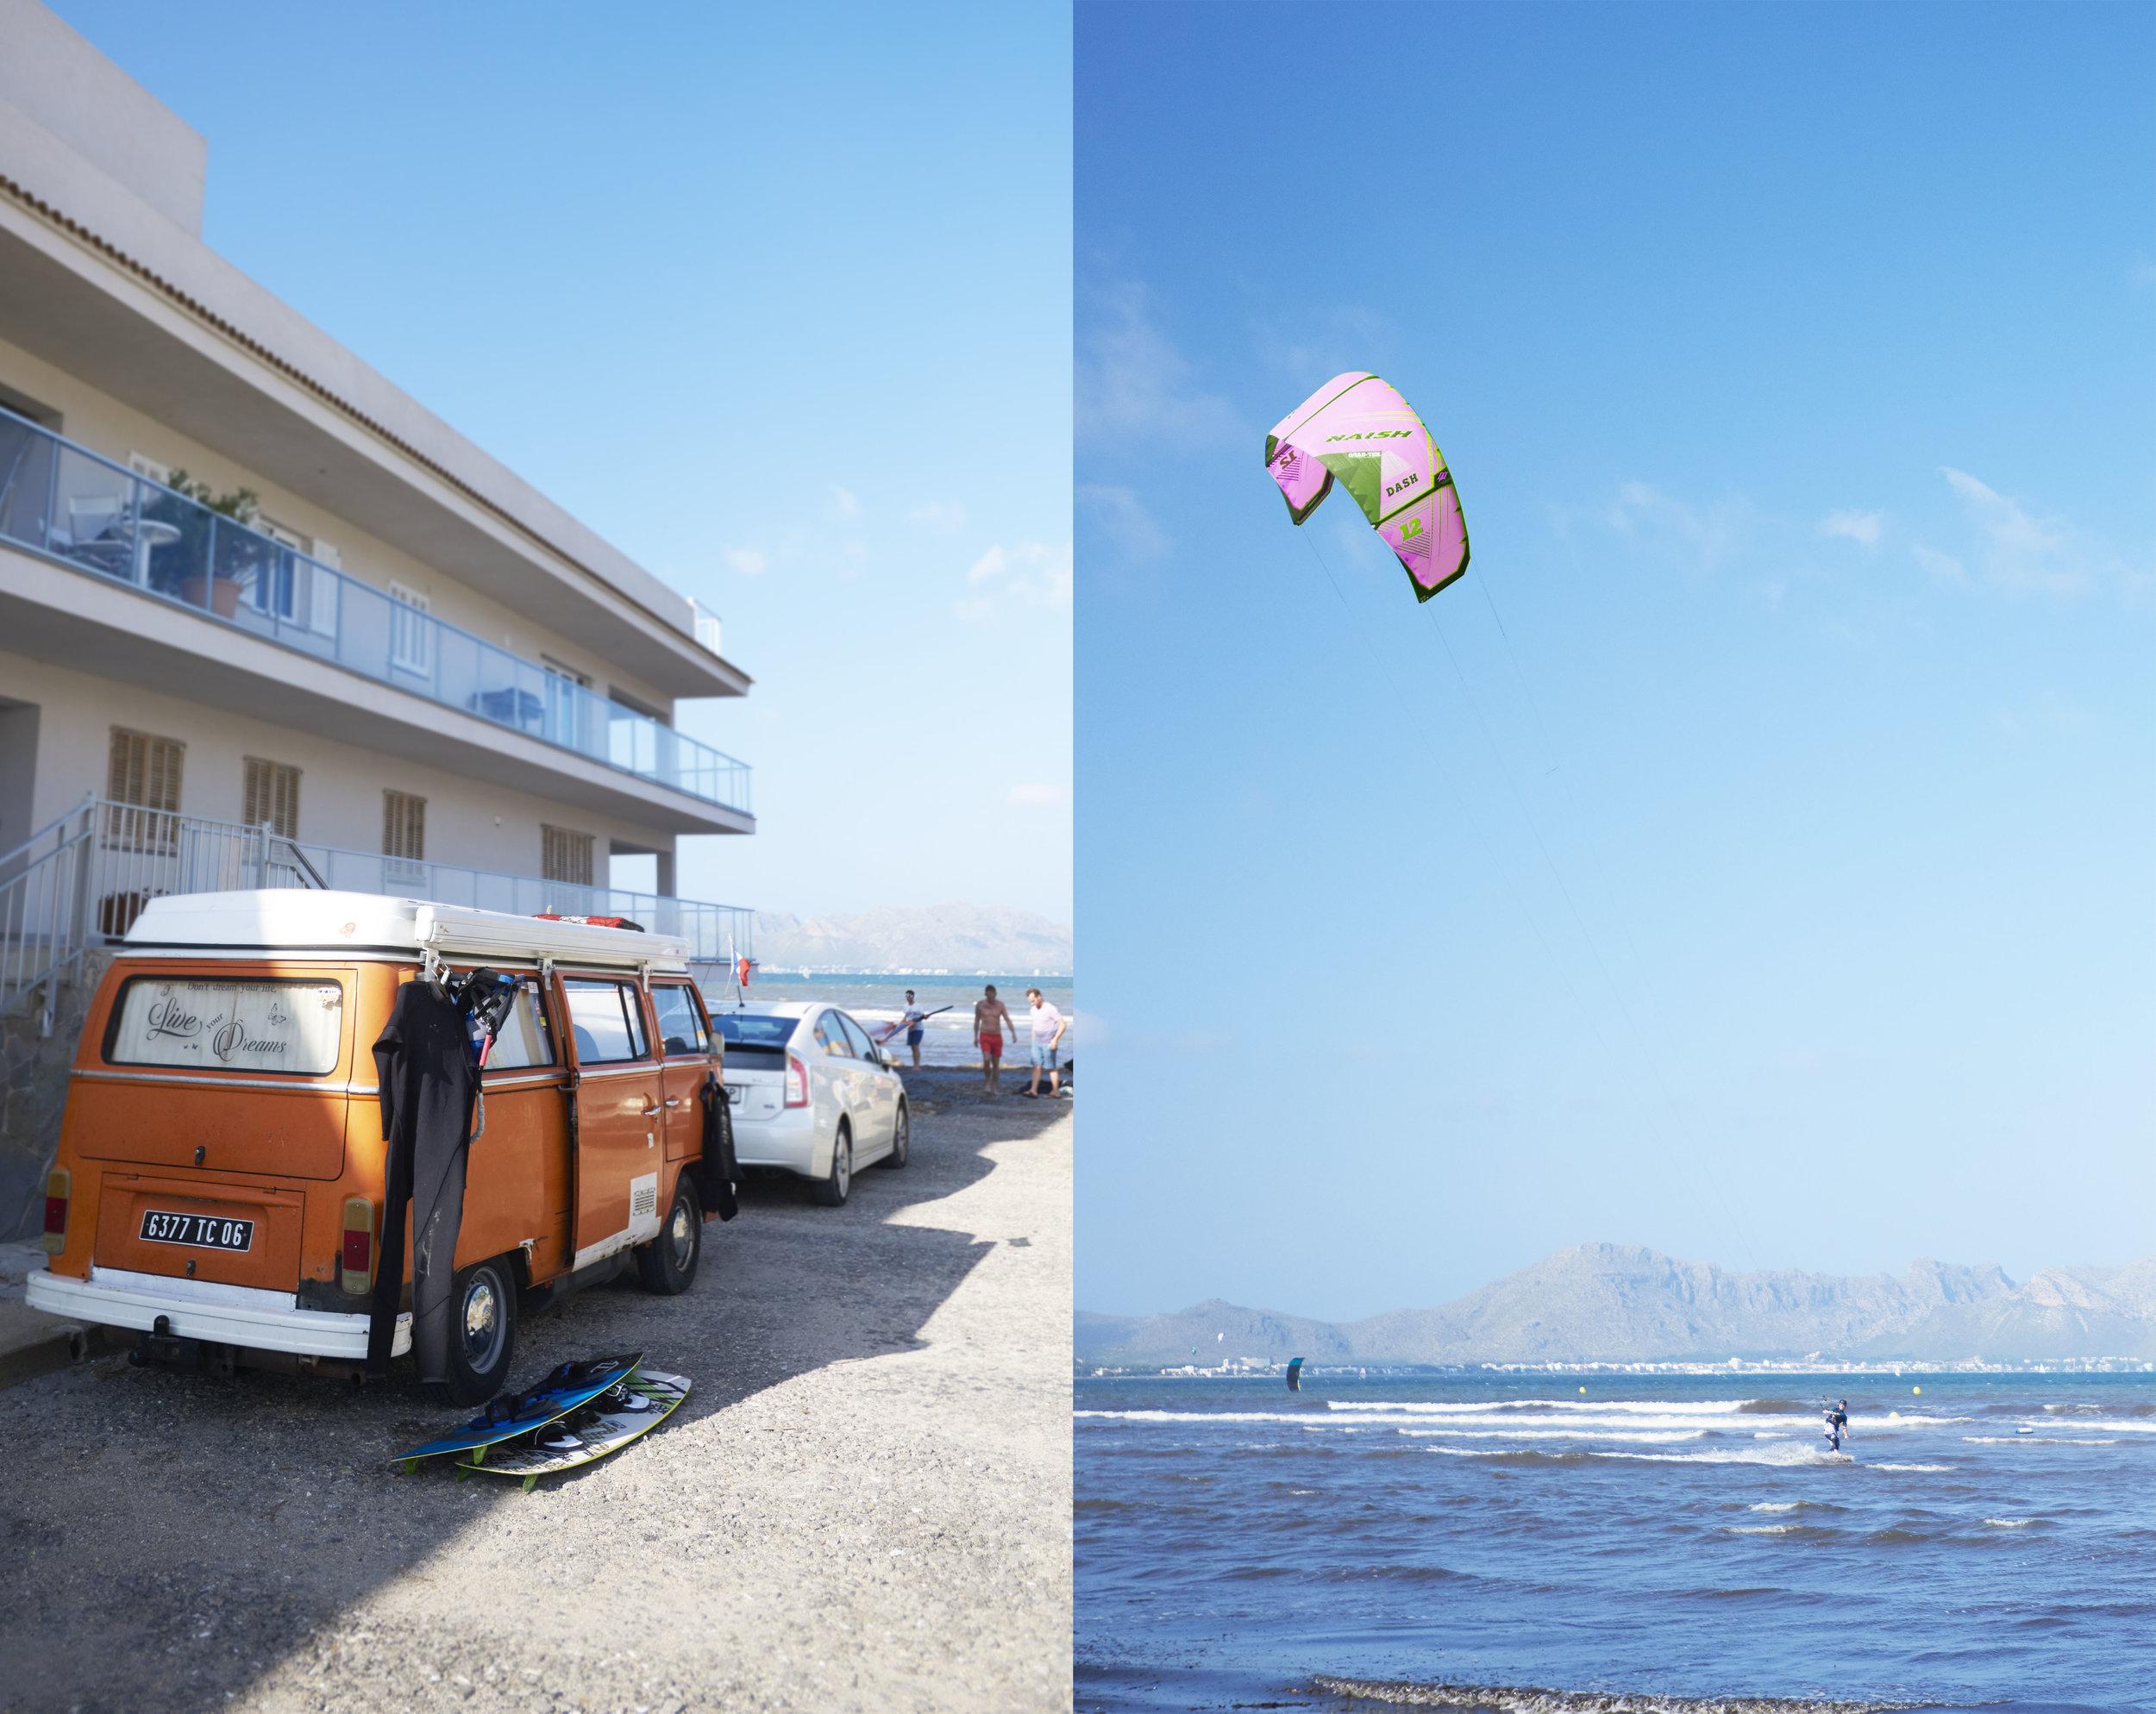 Surfing Van & wind surfer Mallorca.jpg